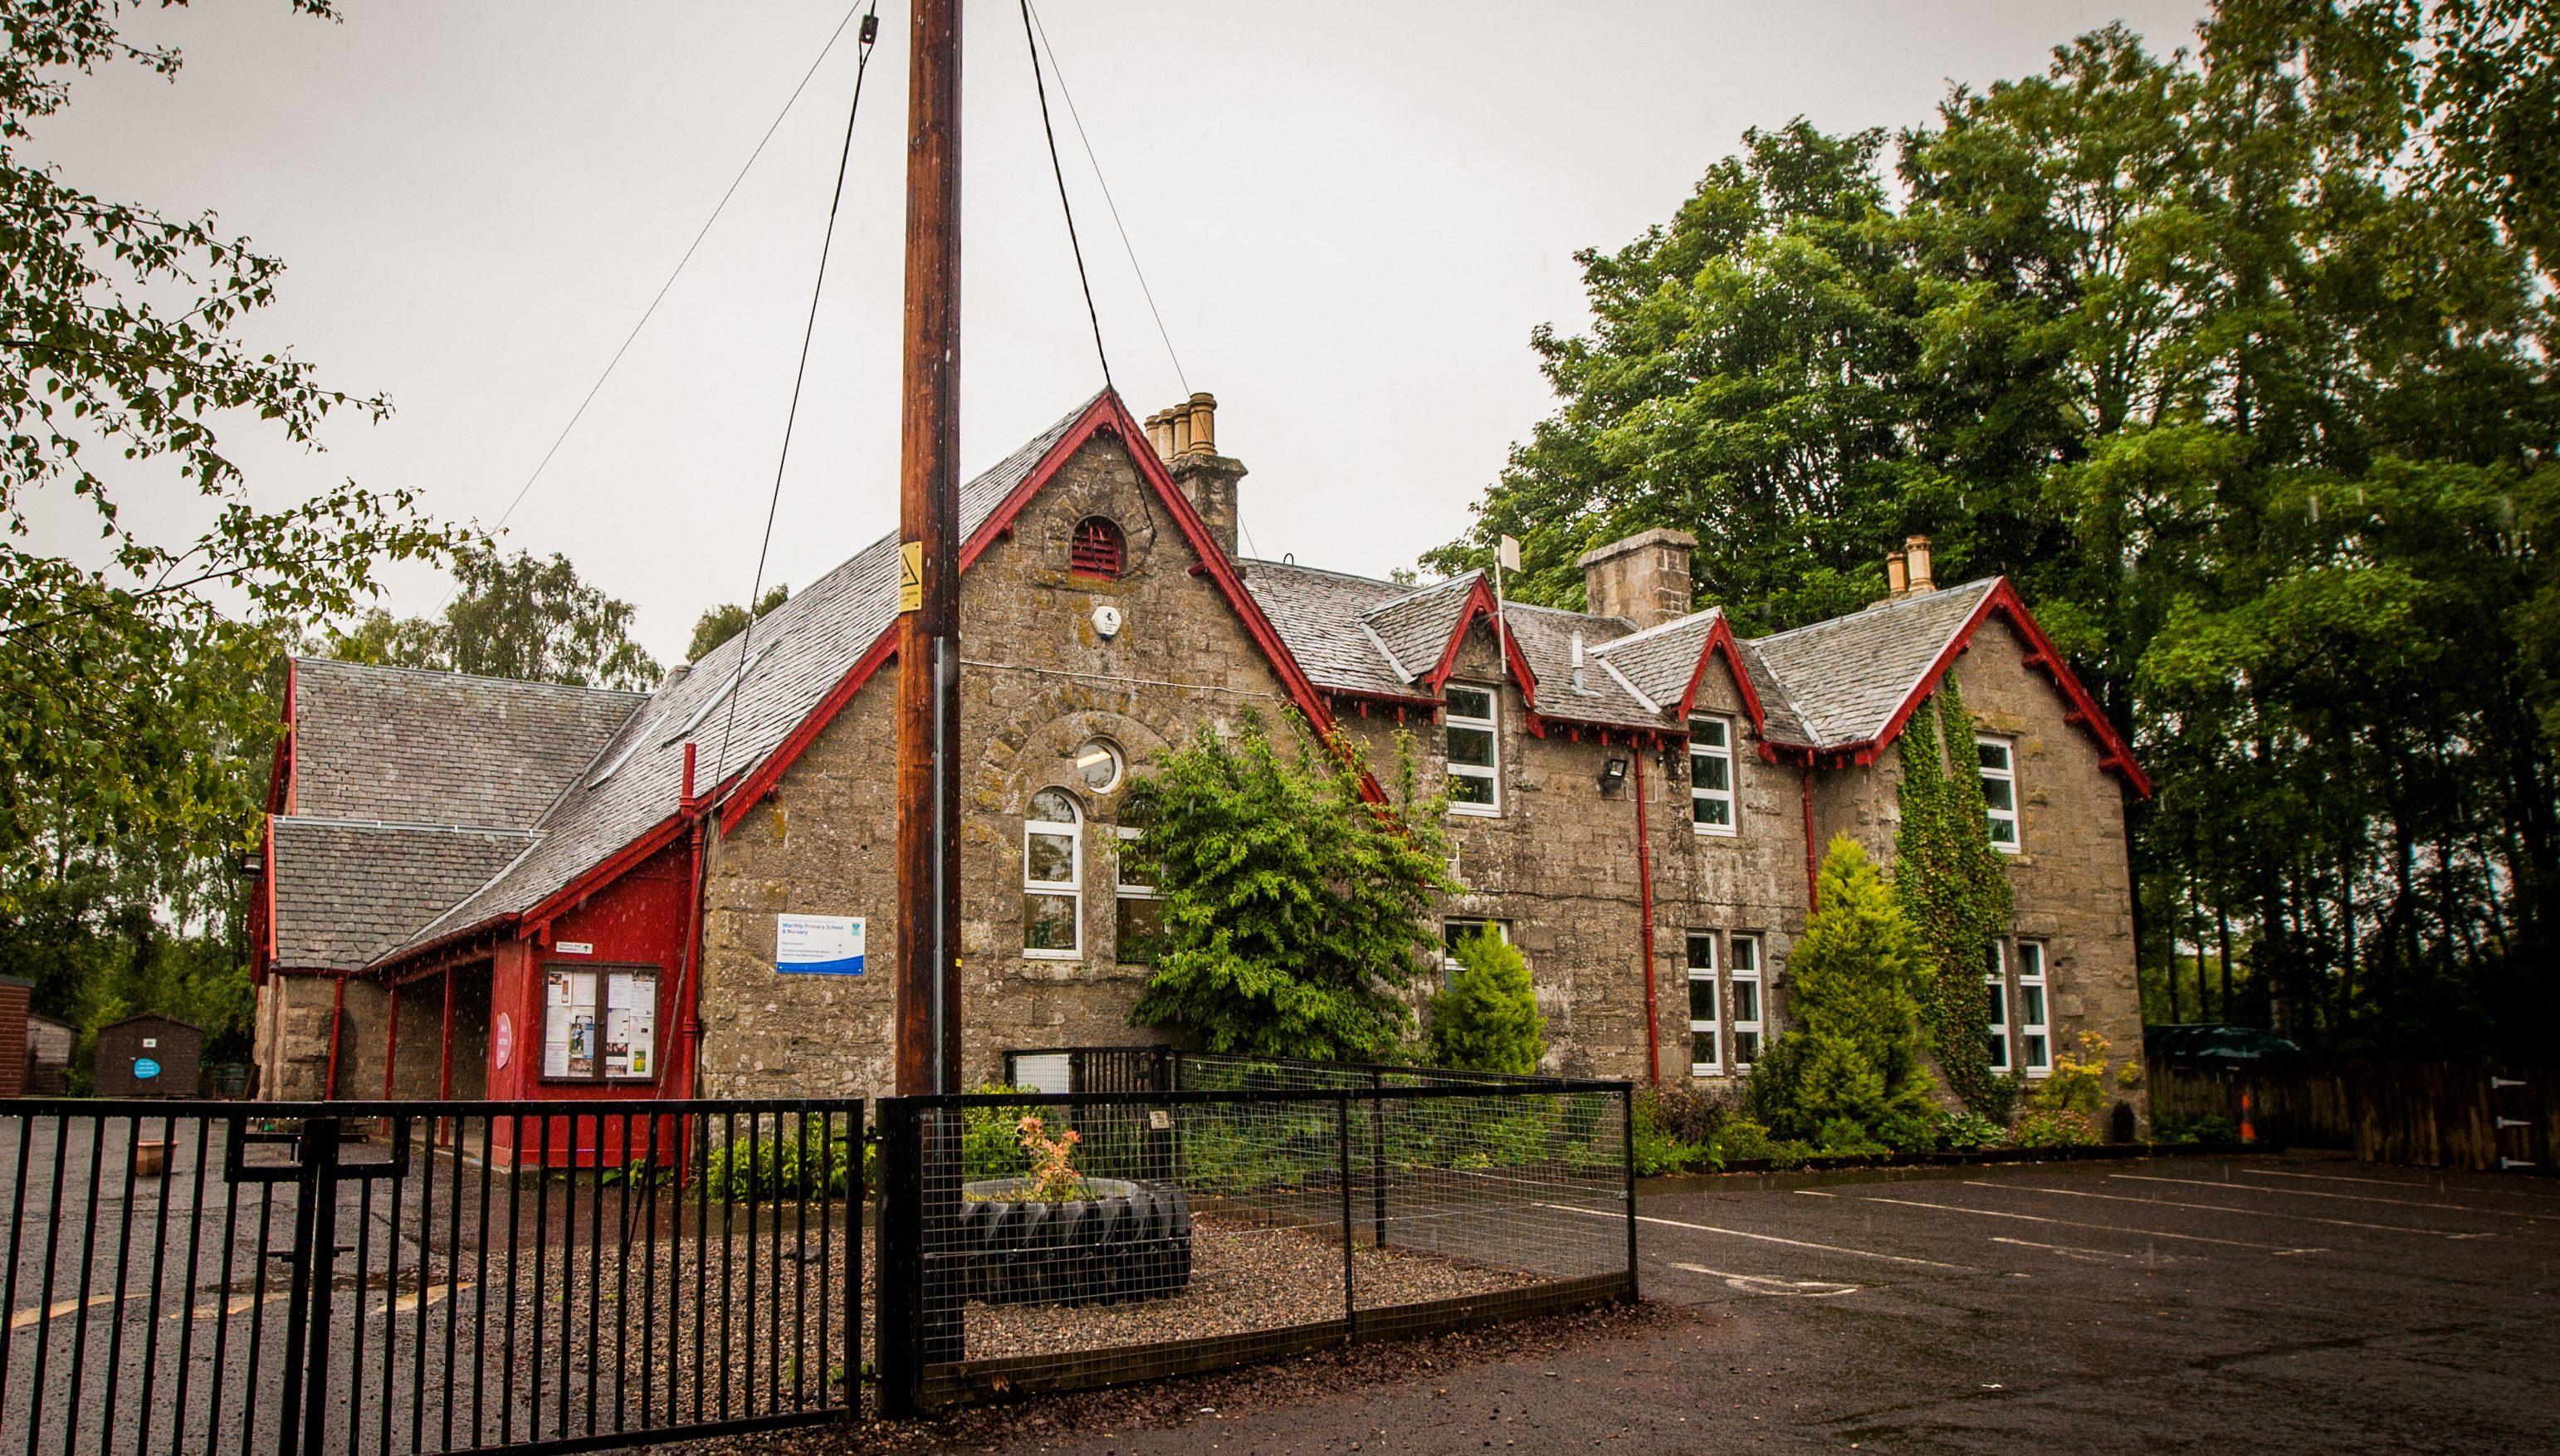 Murthly Primary School